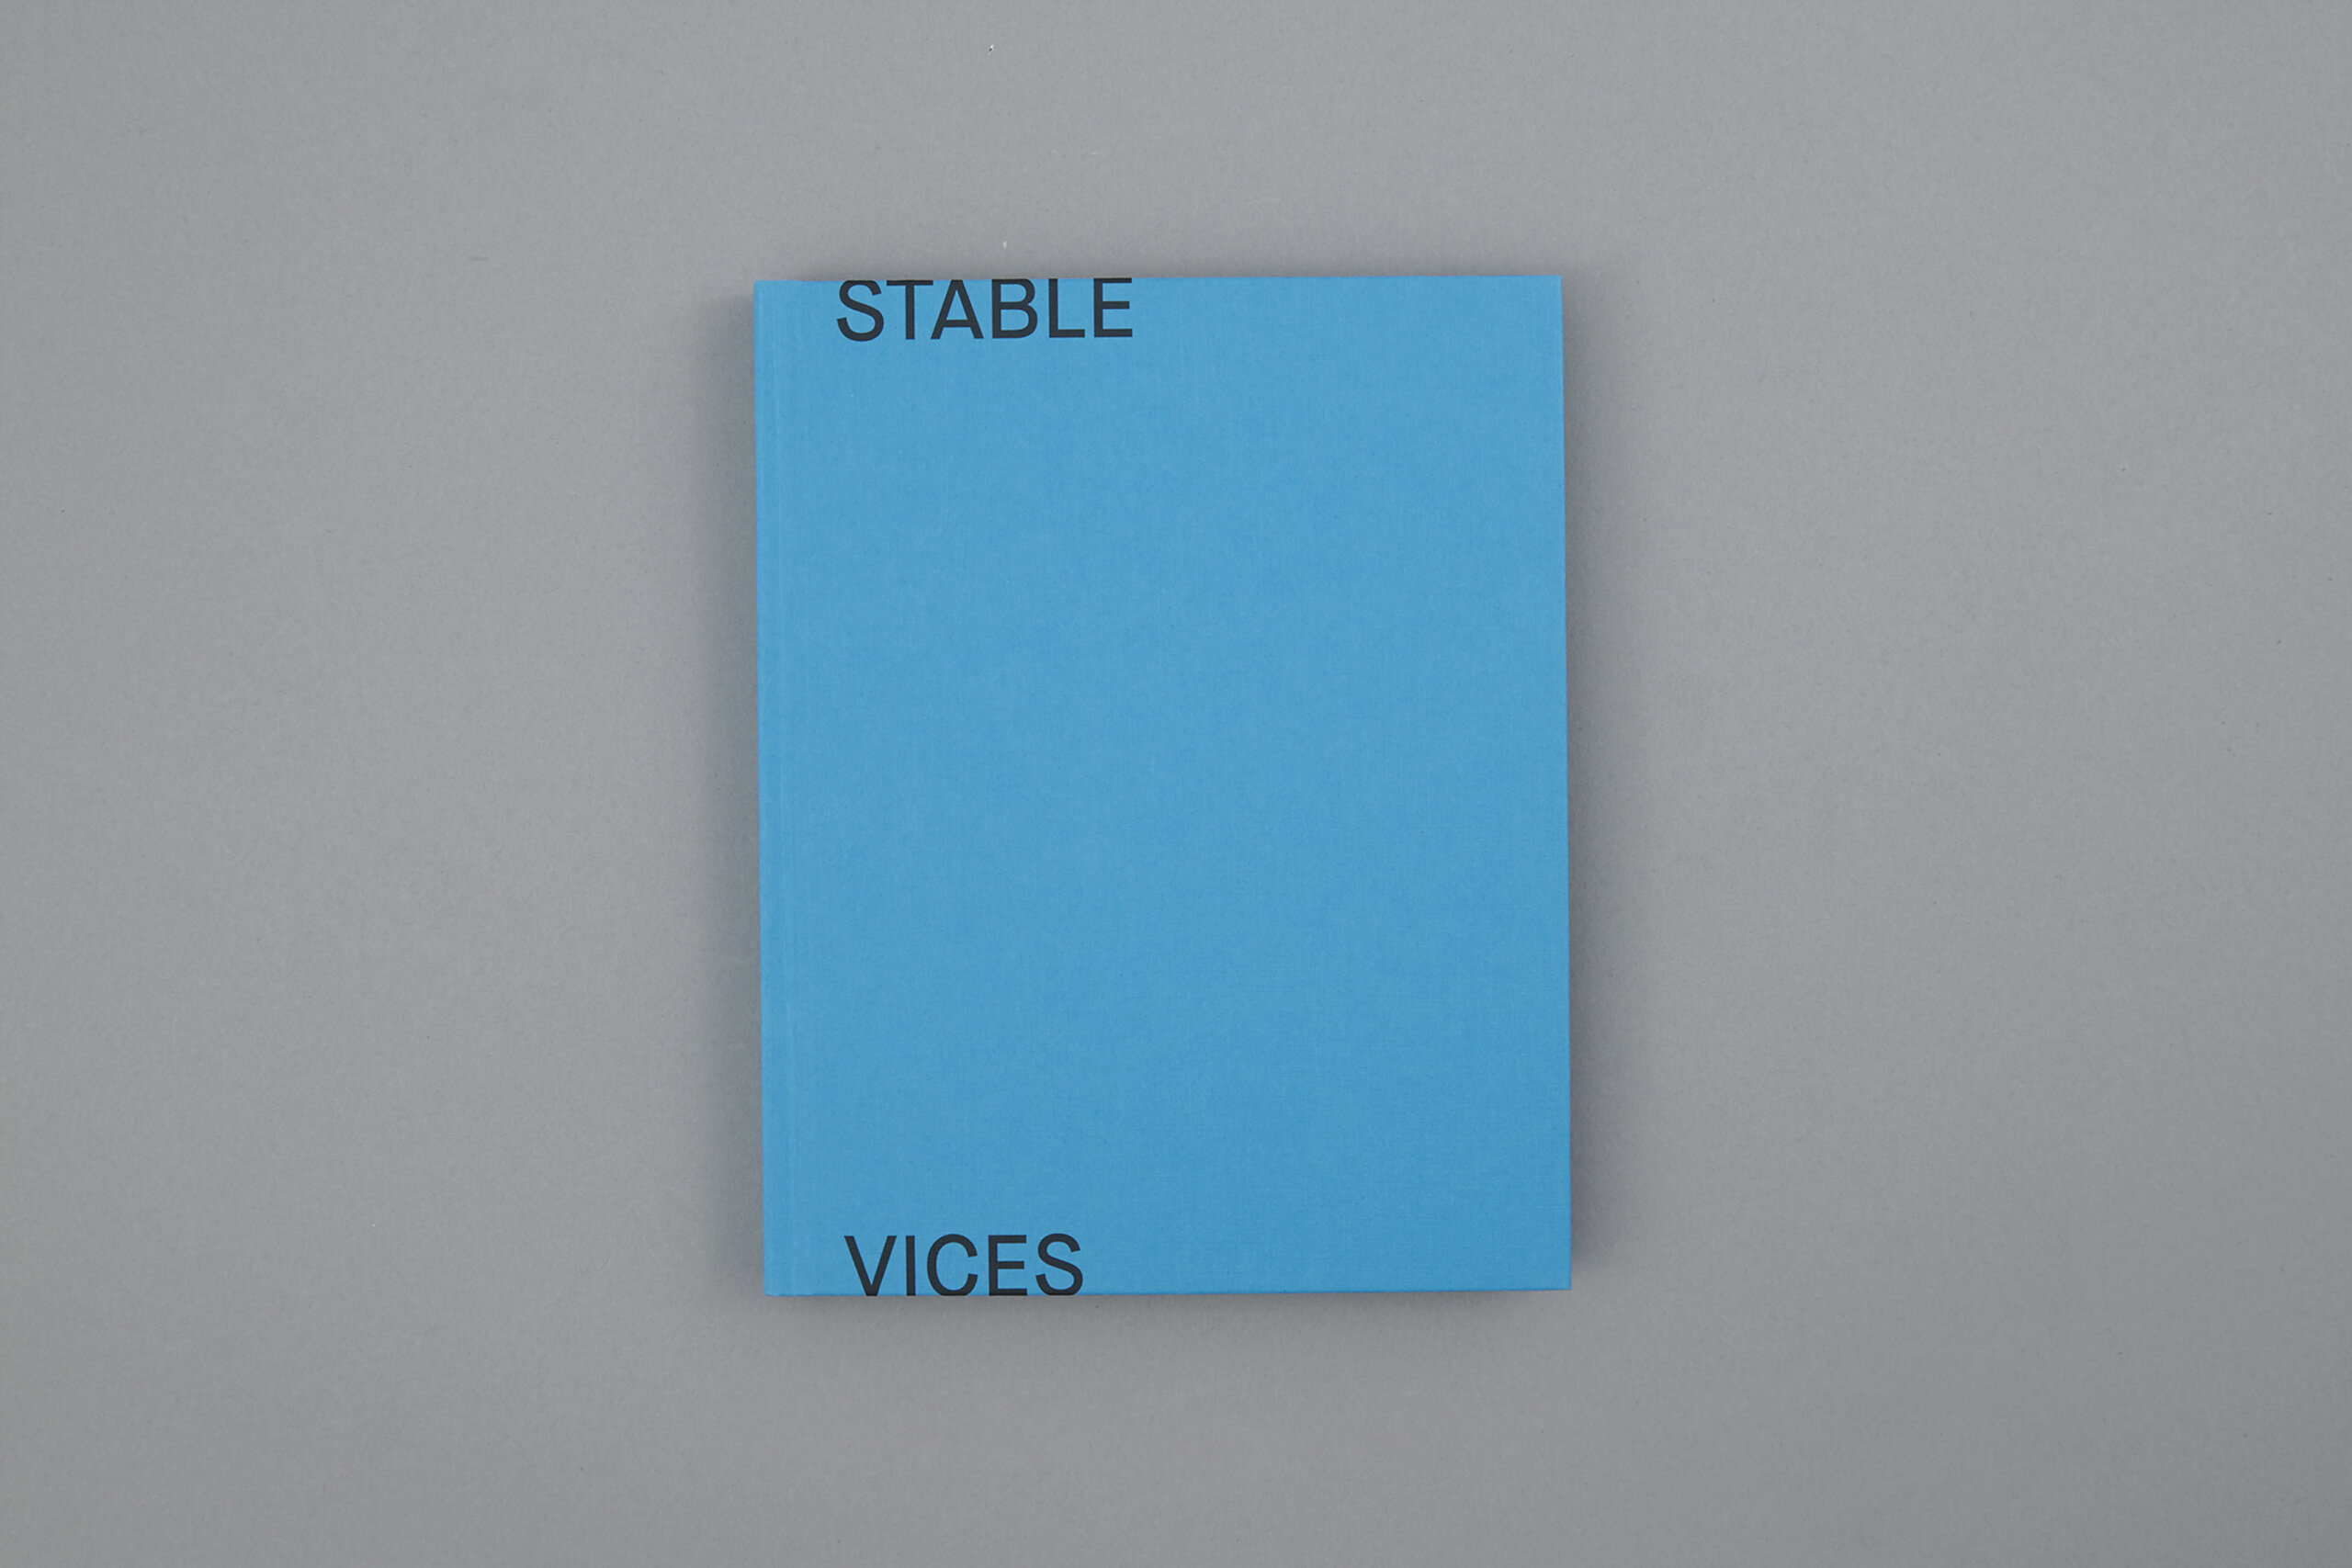 piotrowska-stable-vices-delpire-co